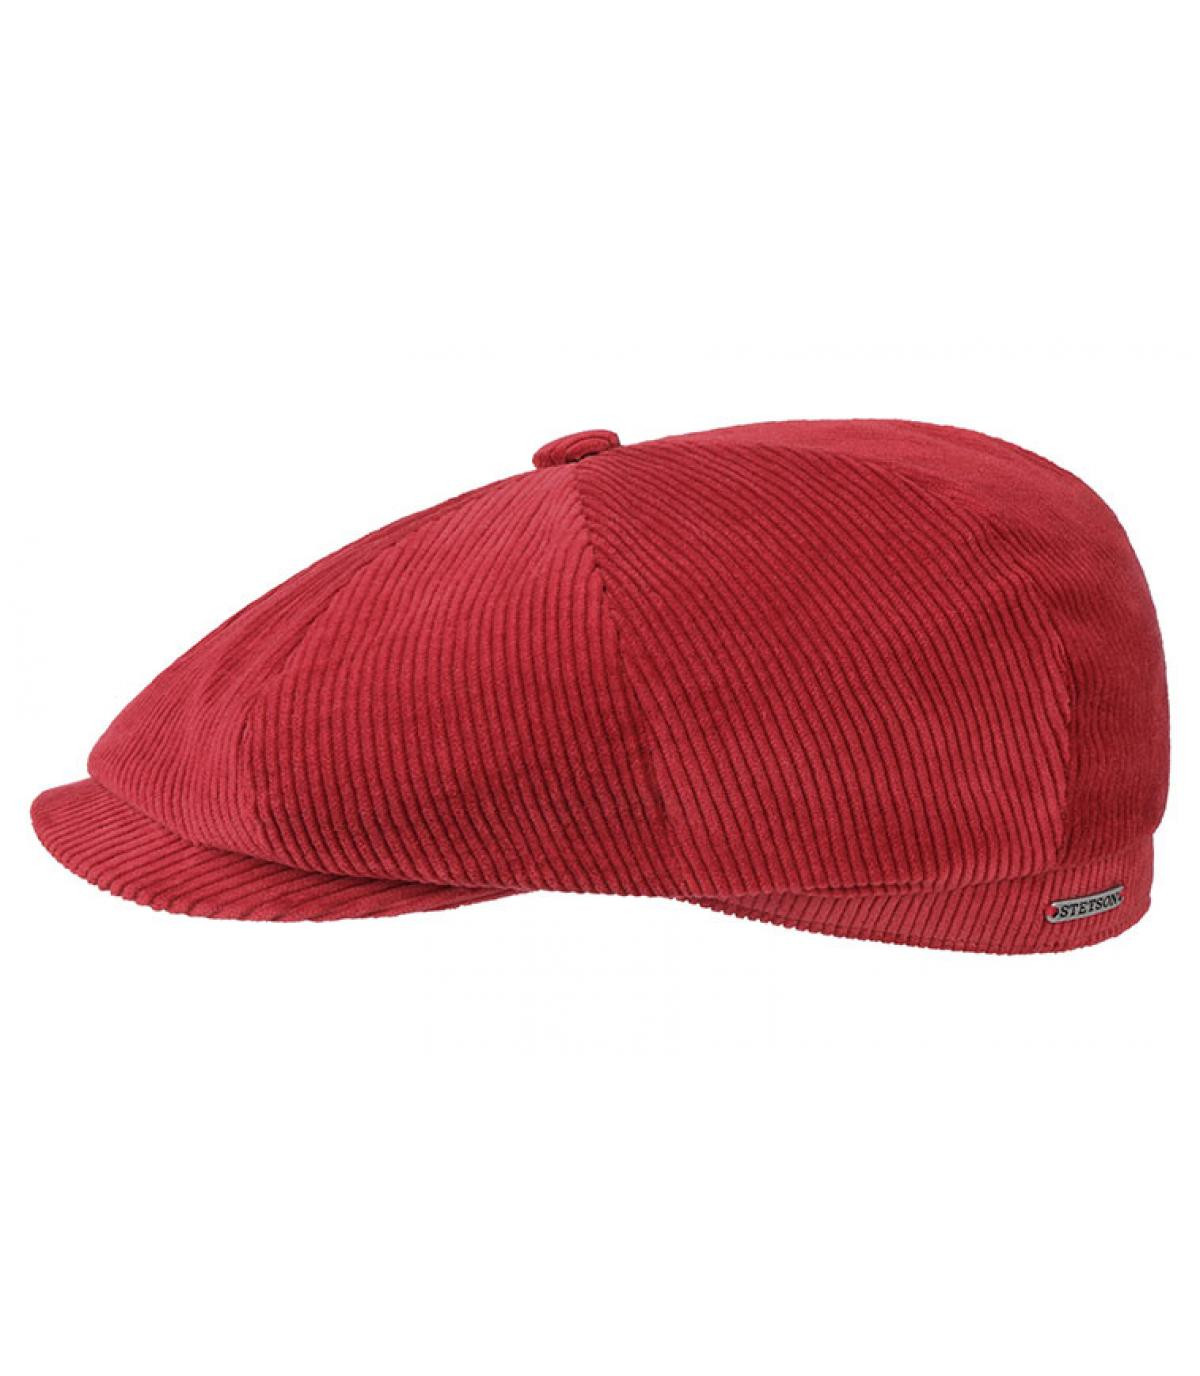 gorra repartidor pana granate